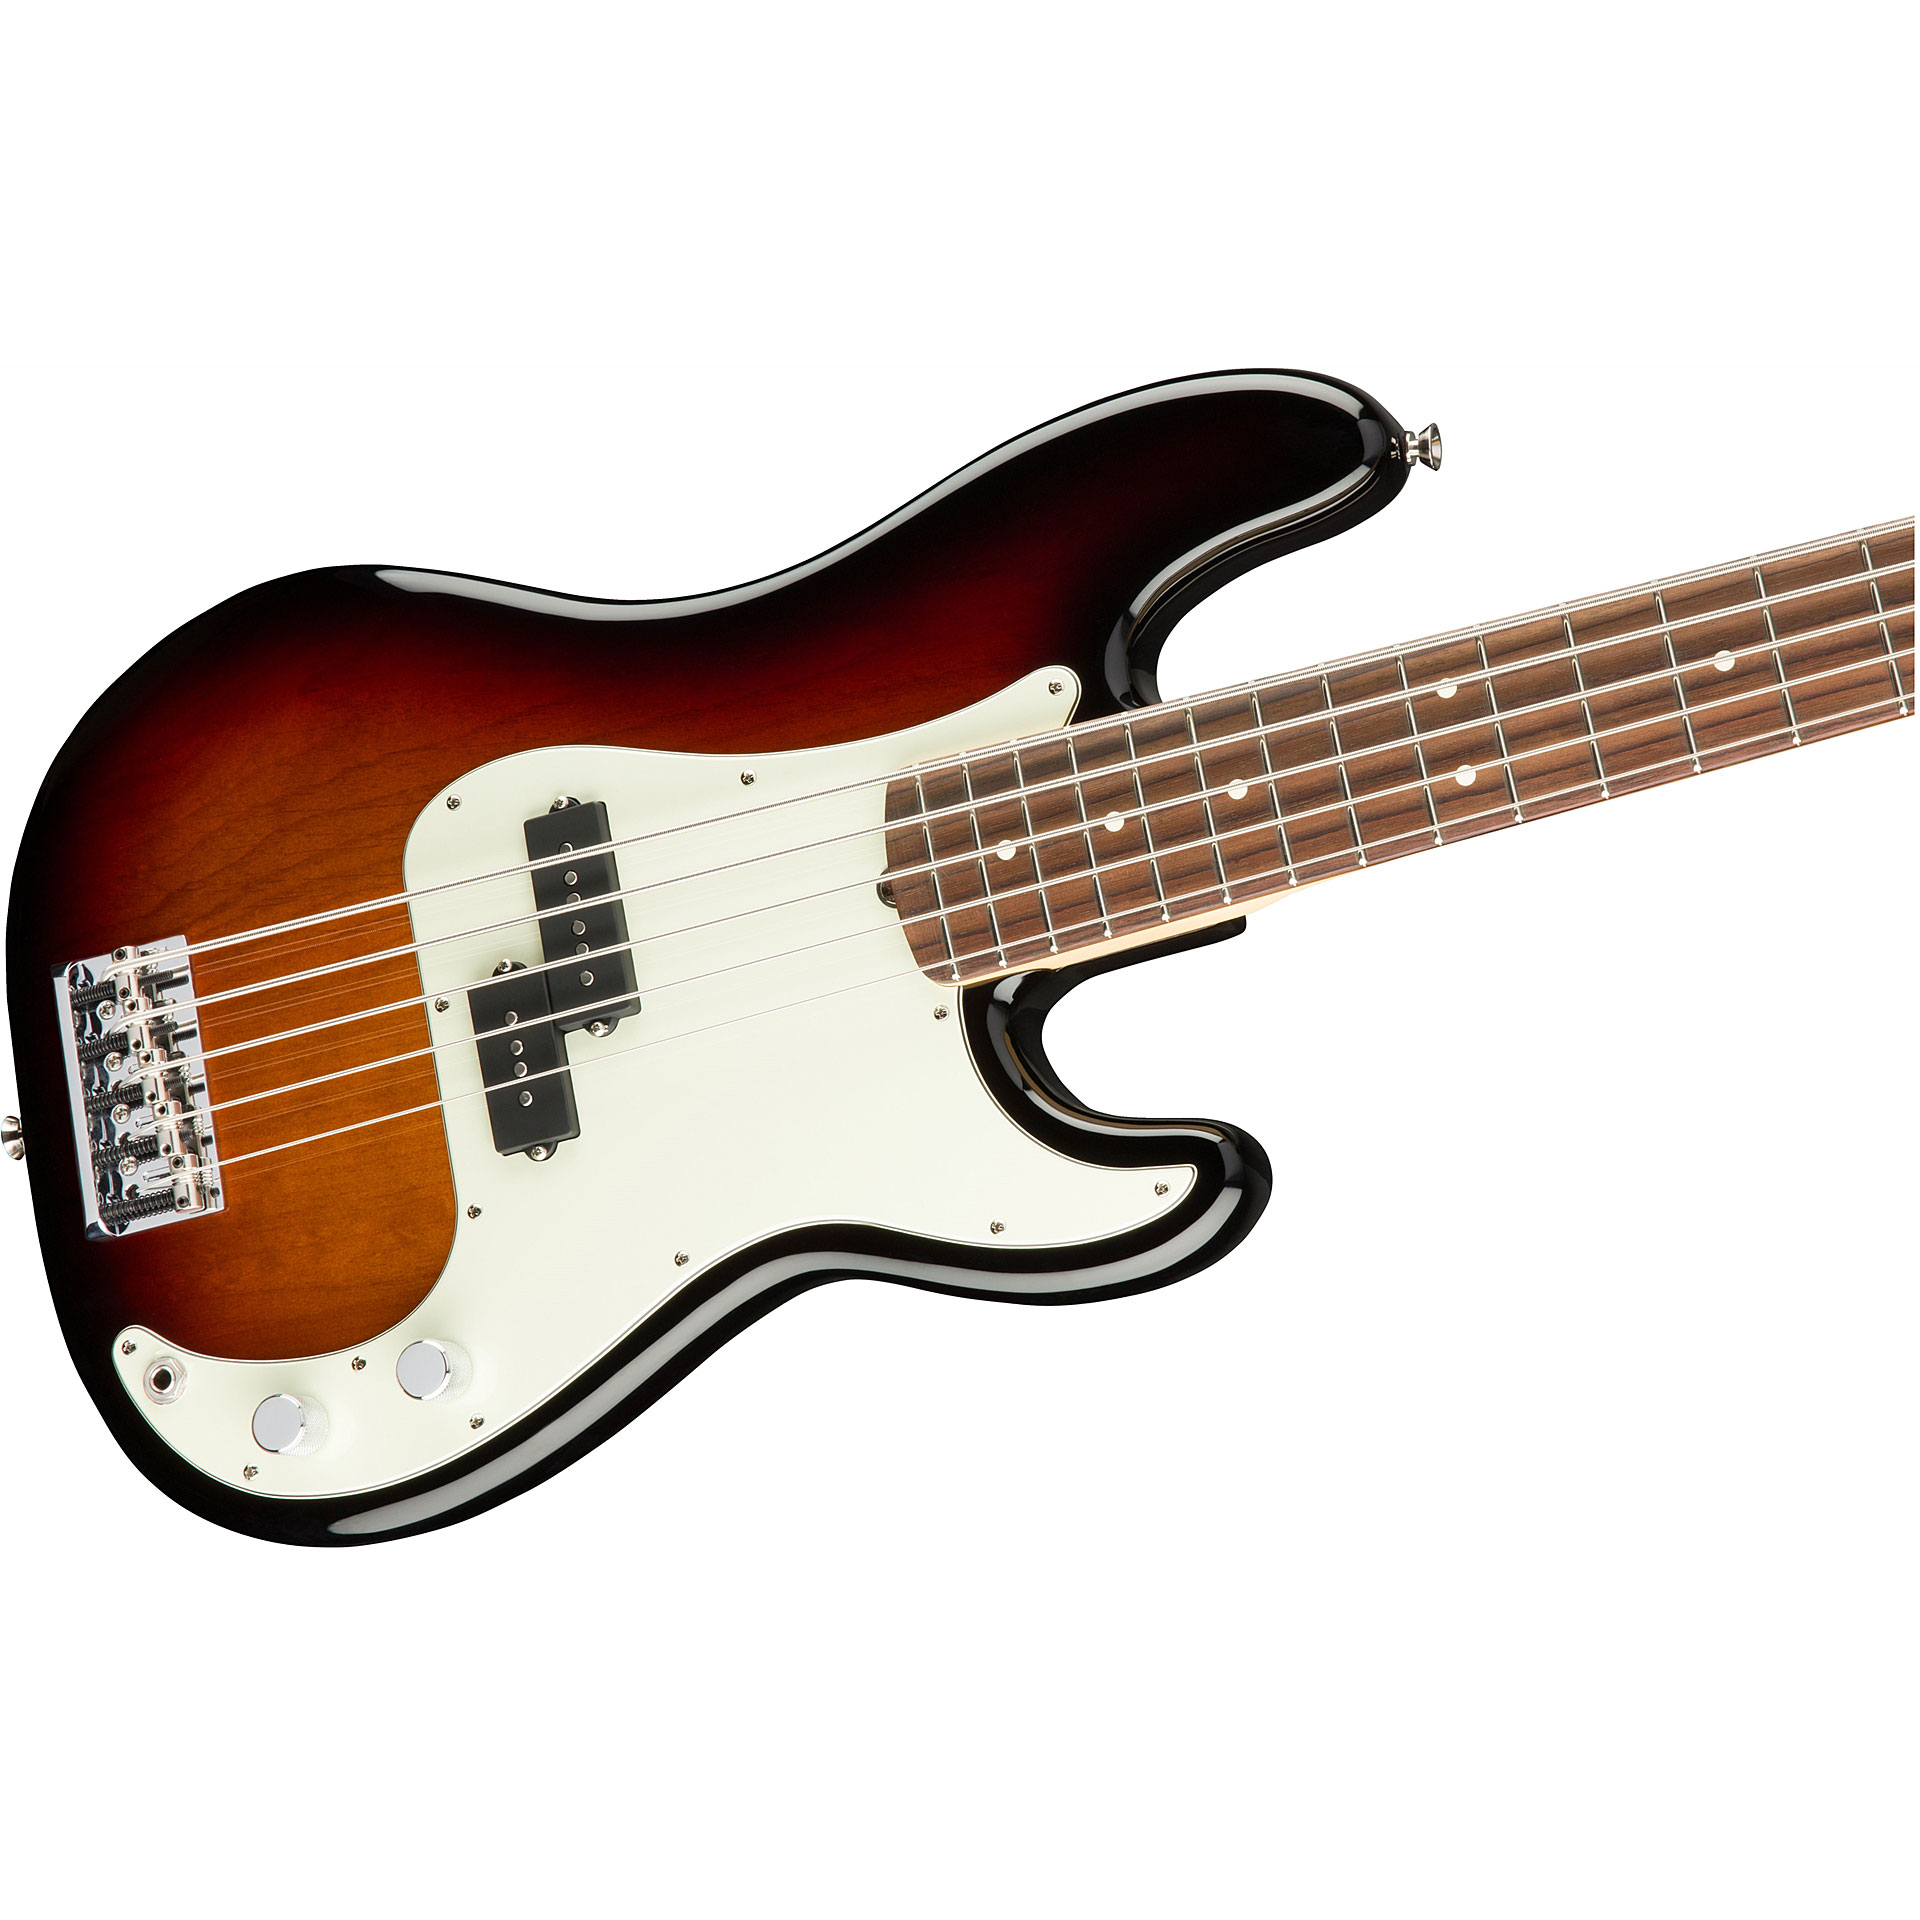 fender american pro p bass v rw 3ts electric bass guitar. Black Bedroom Furniture Sets. Home Design Ideas